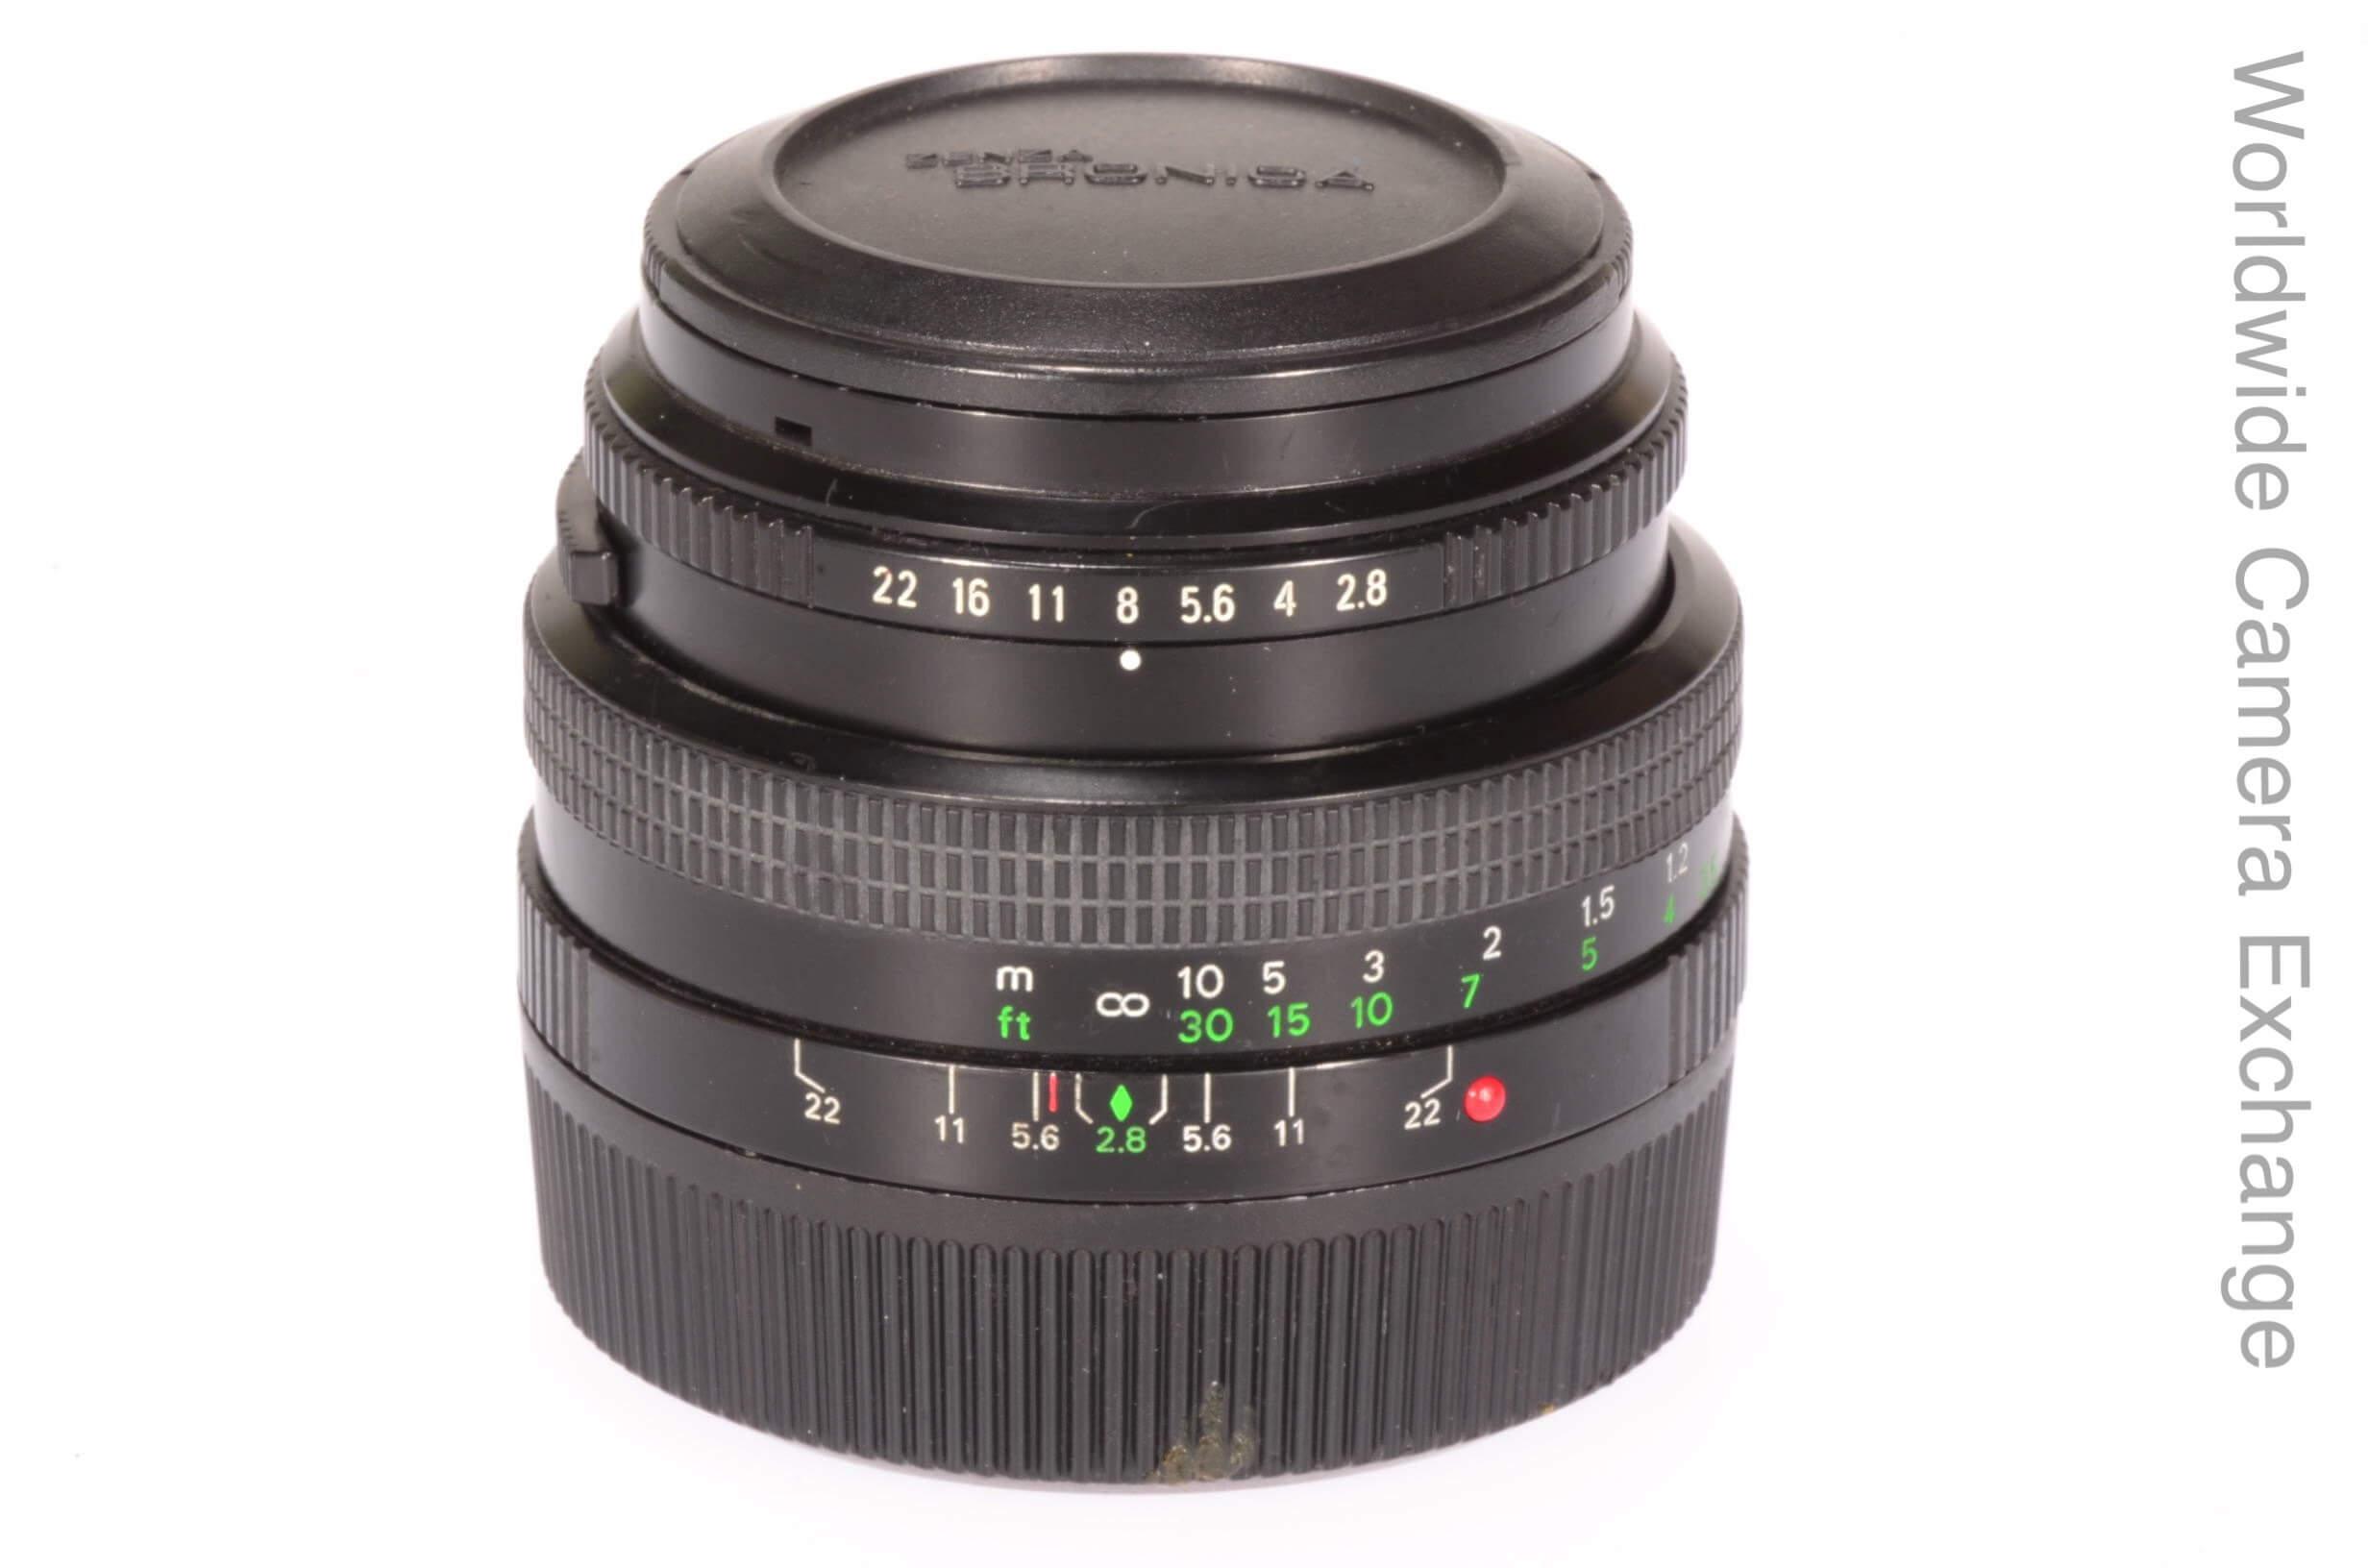 Bronica 50mm f2.8 Zenzanon PE lens